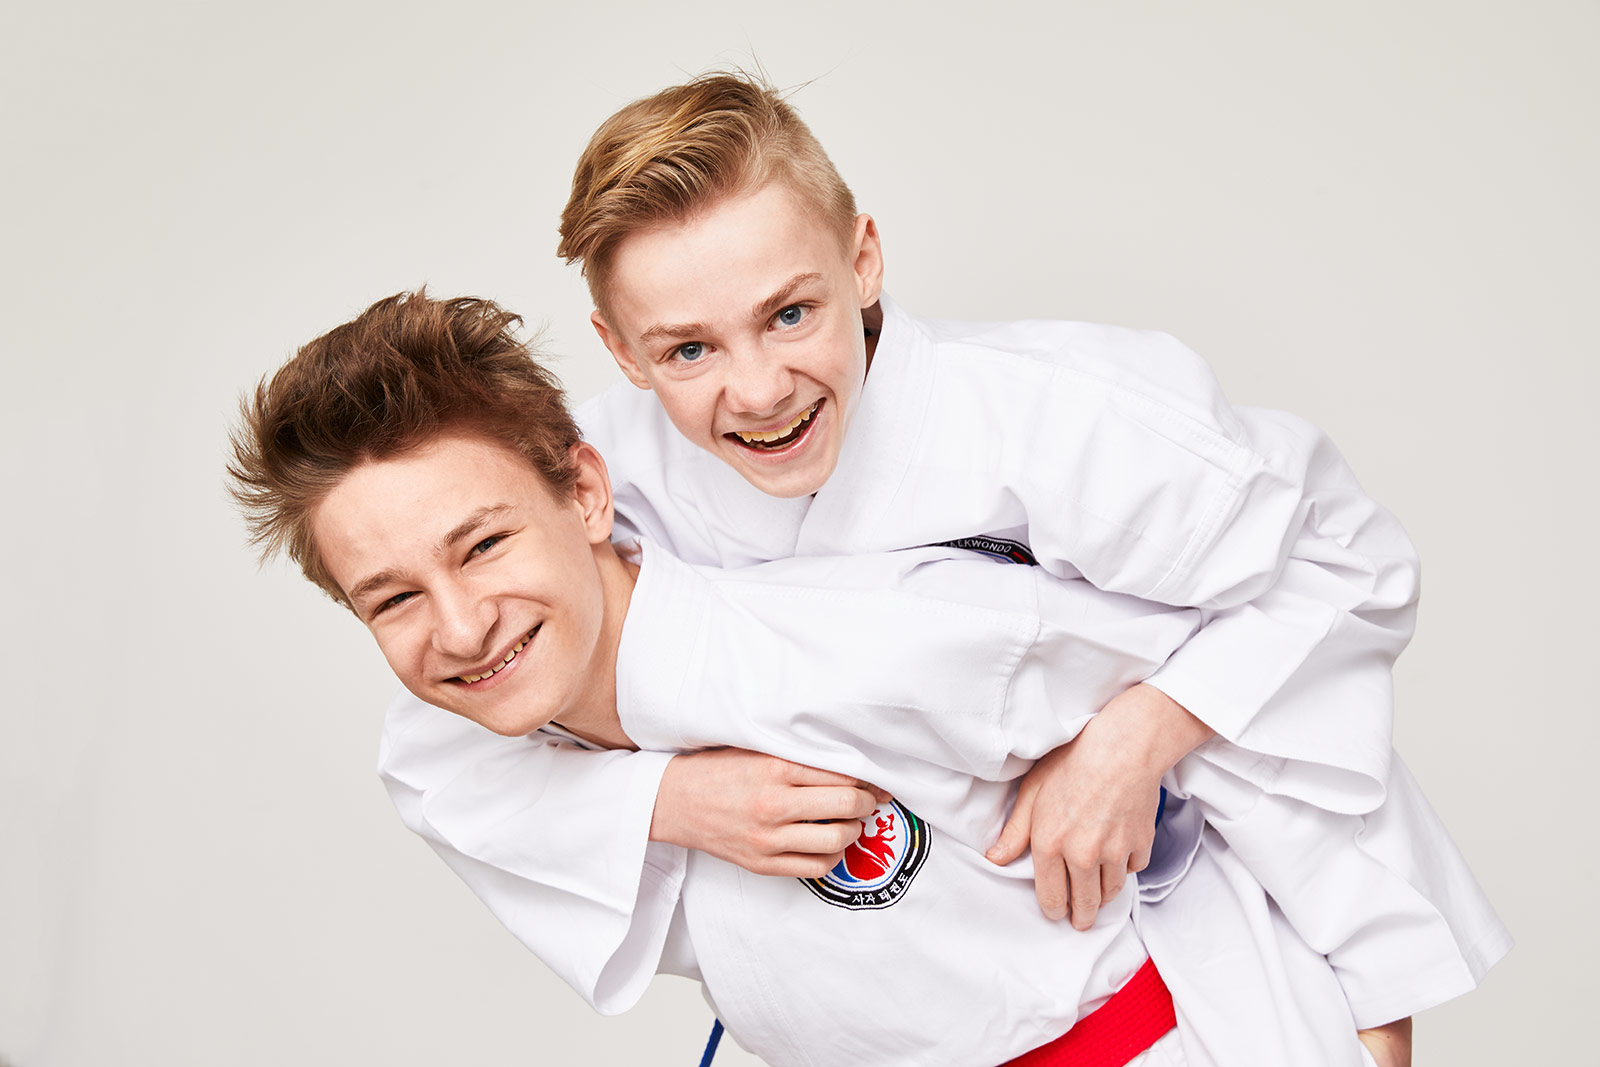 Taekwondo-Schüler